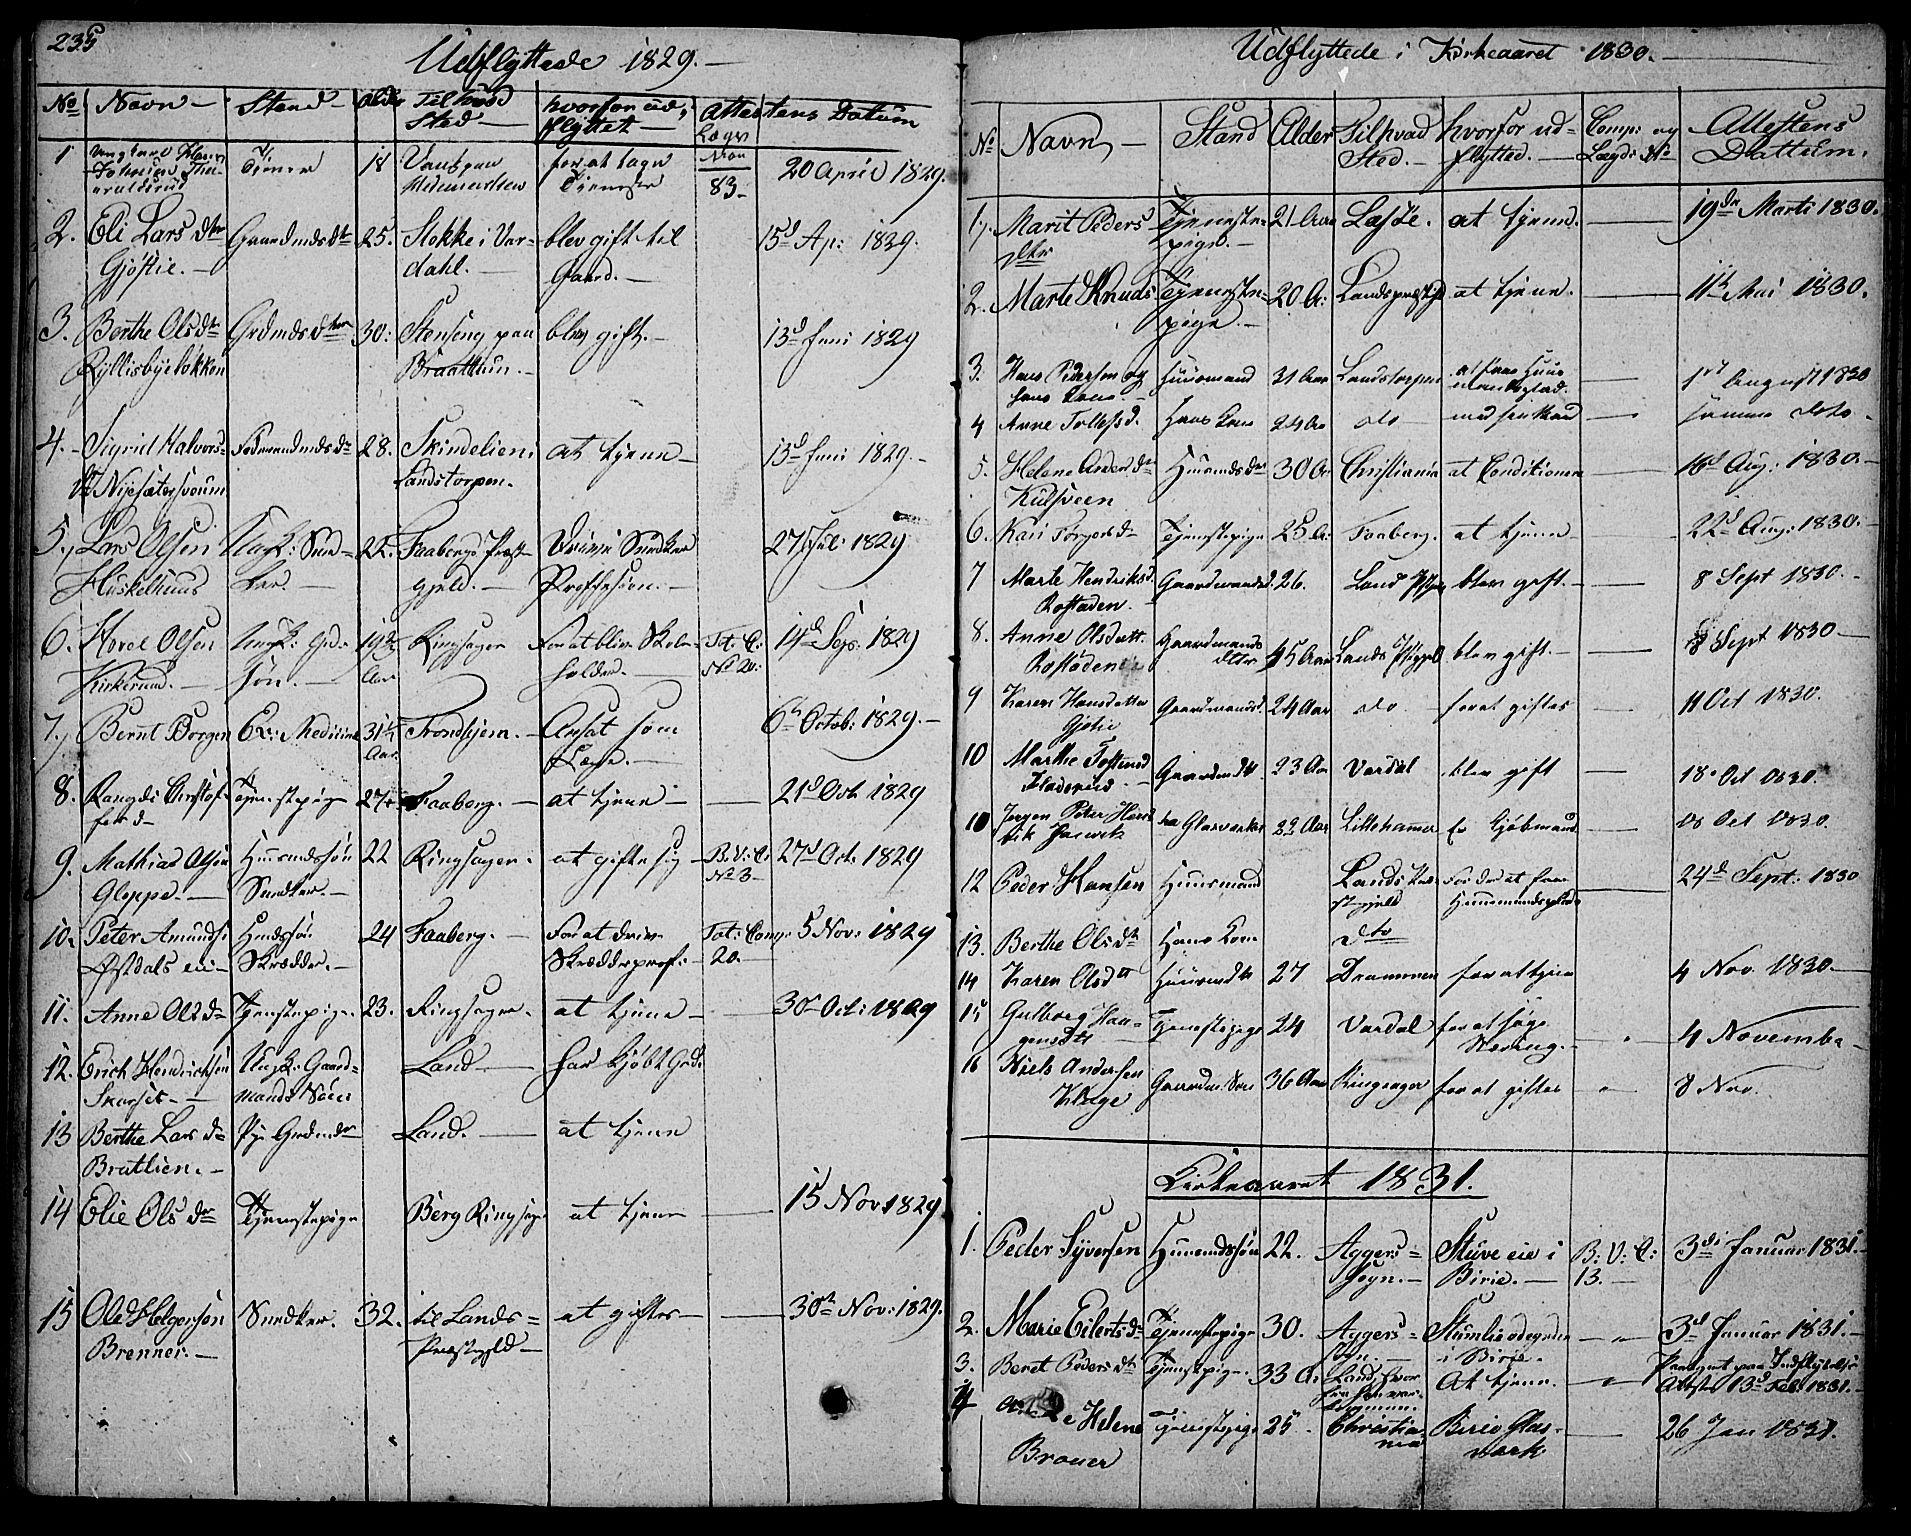 SAH, Biri prestekontor, Ministerialbok nr. 4, 1829-1842, s. 235